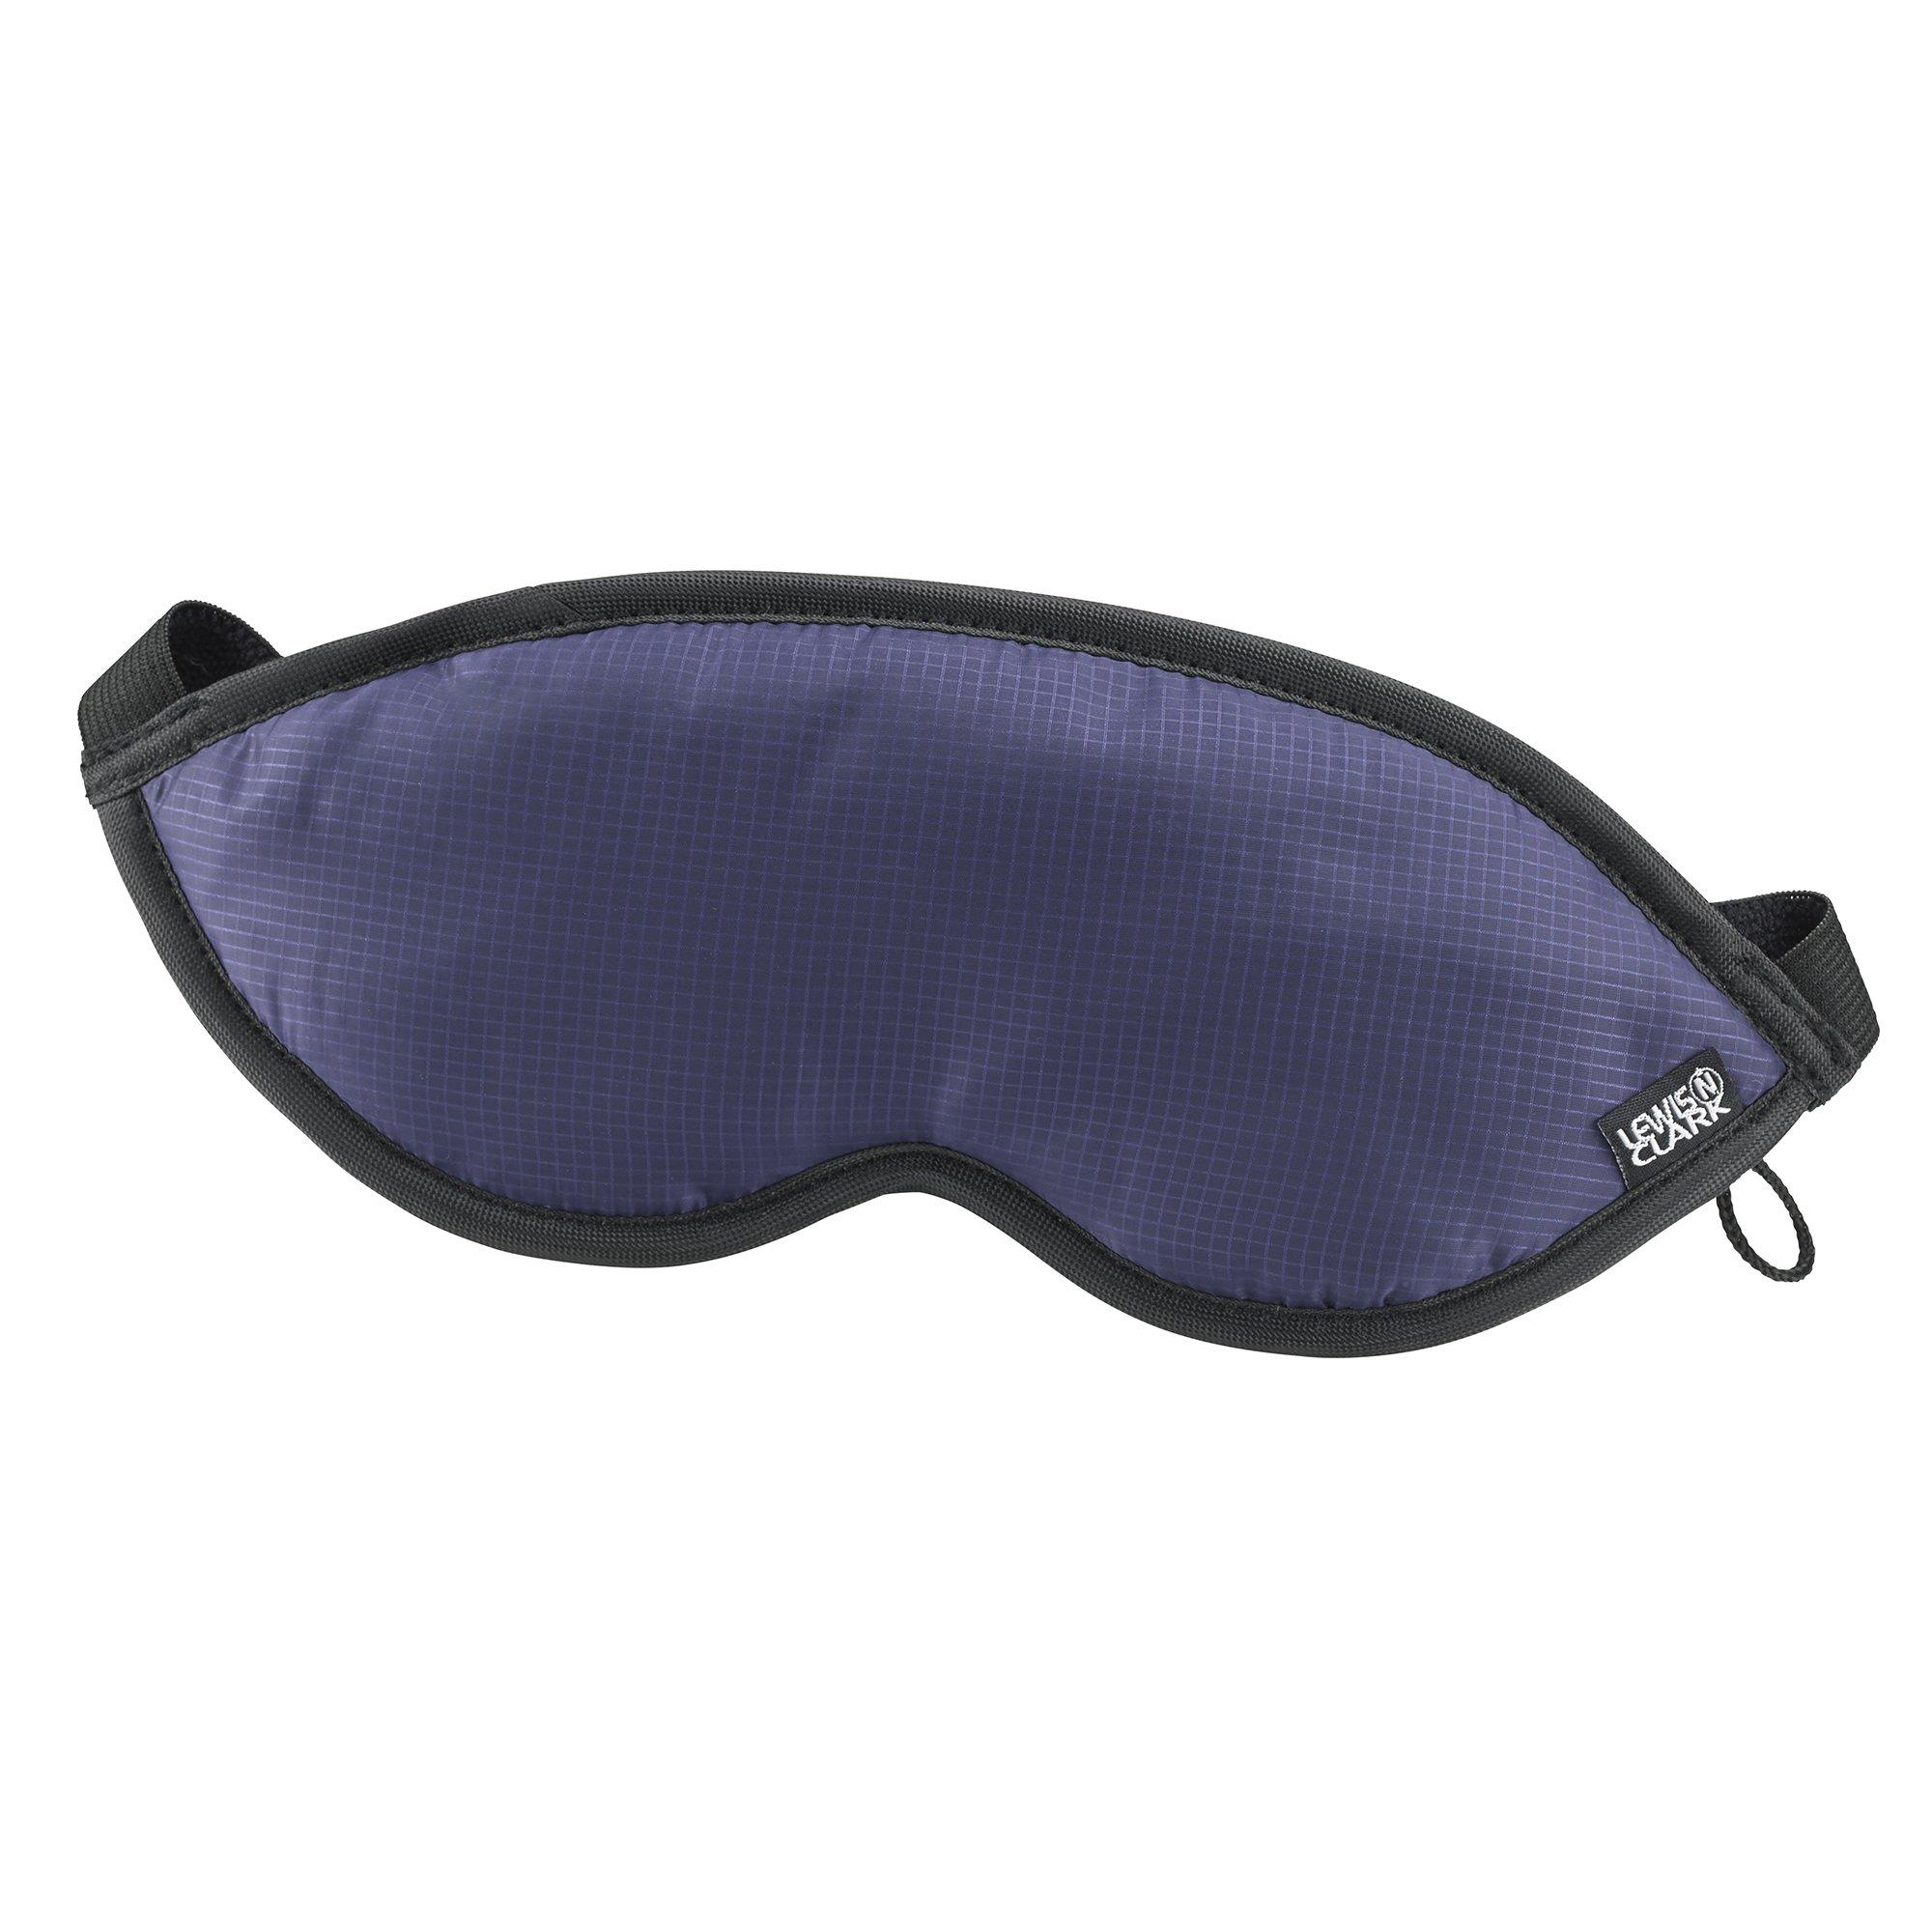 Lewis N. Clark Comfort Eye Mask With Adjustable Straps Blocks Out All Light, Blue